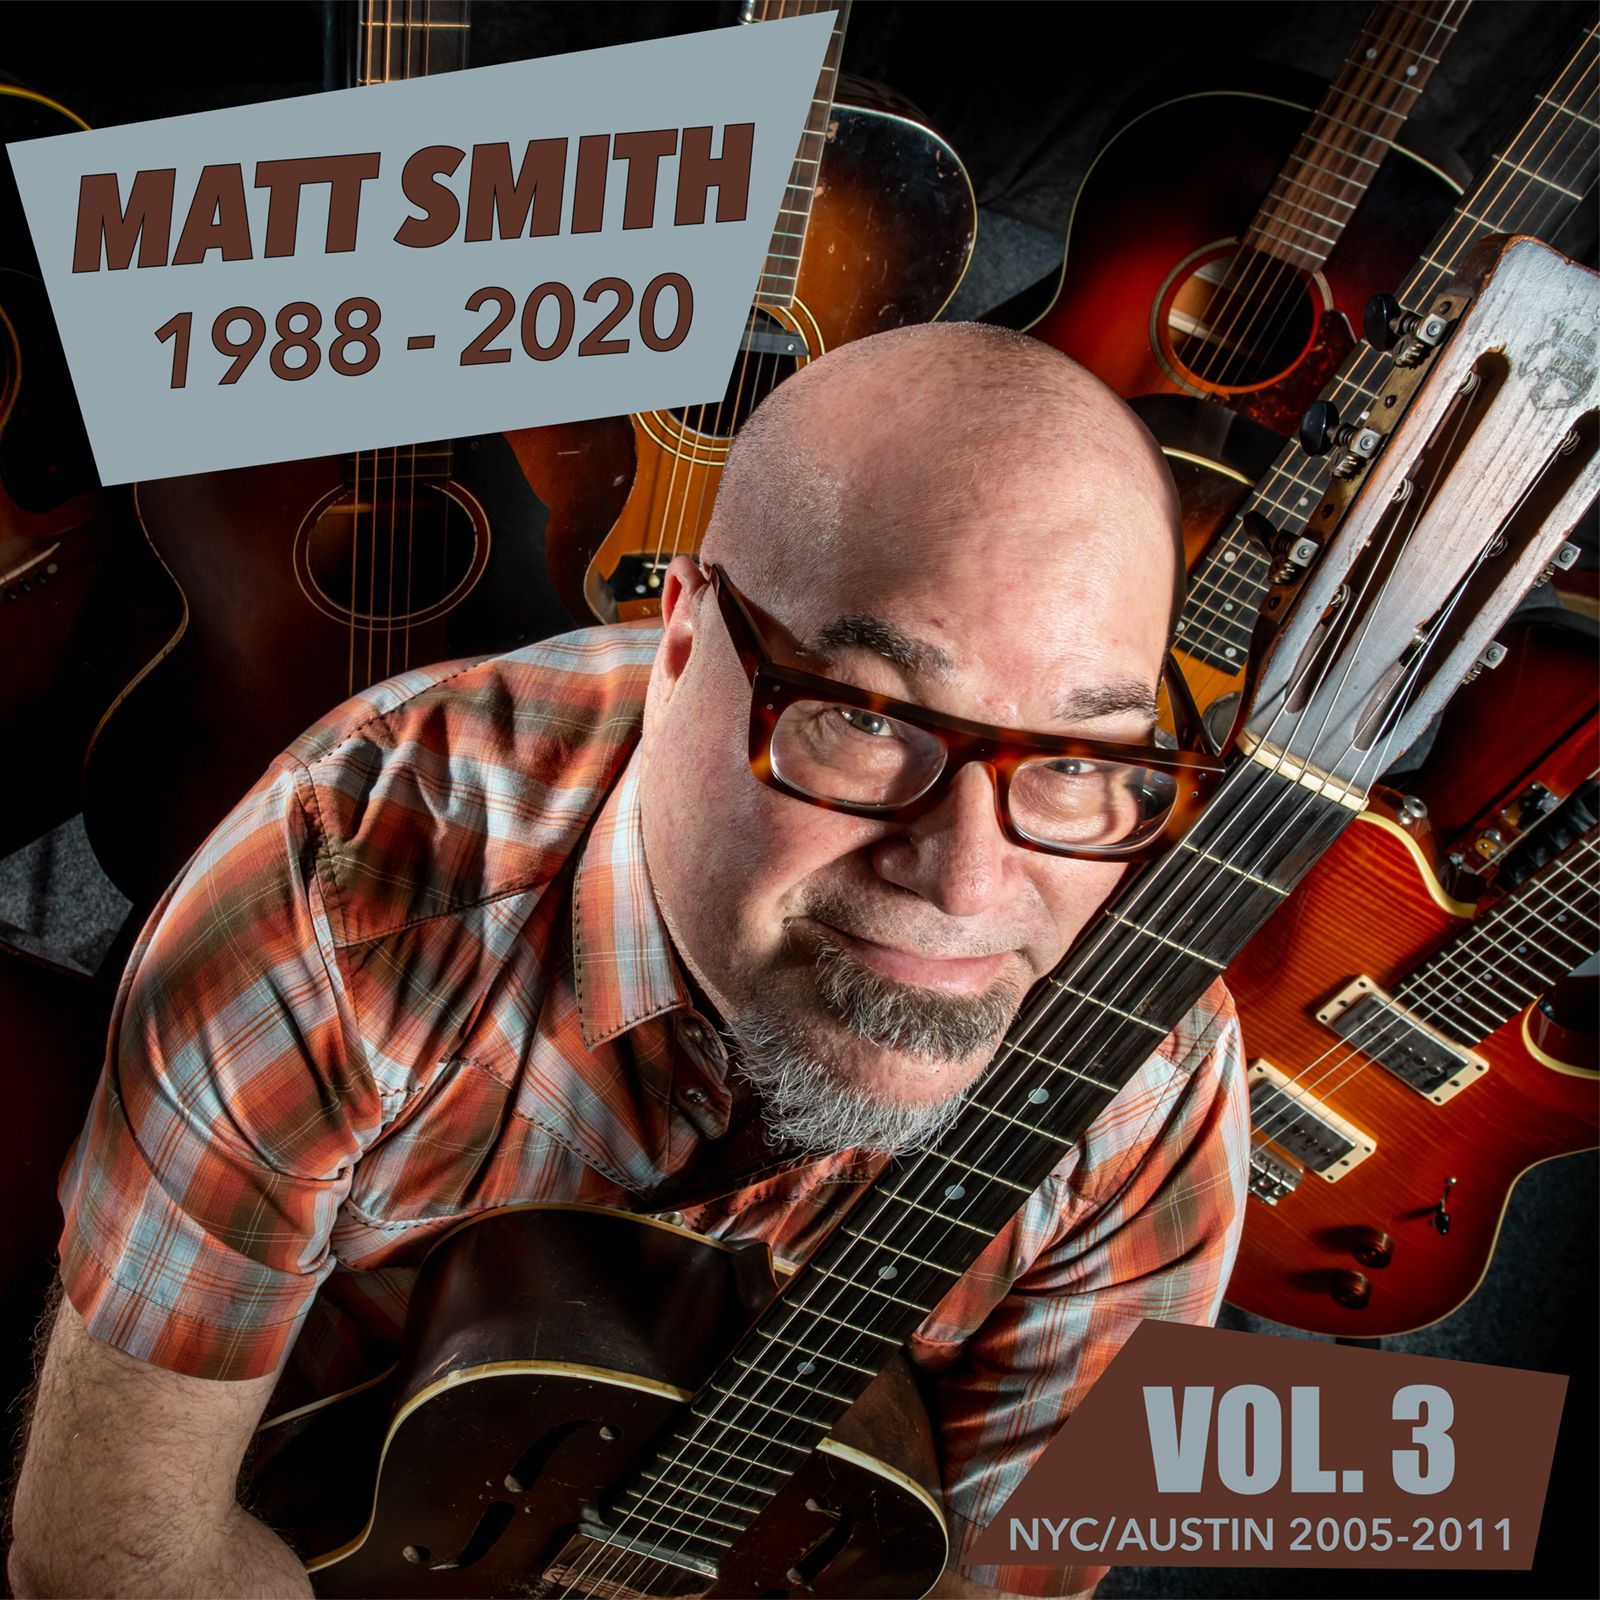 Matt Smith 1988-2020 Vol.3 -  NYC/Austin 2005-2011 Cover art